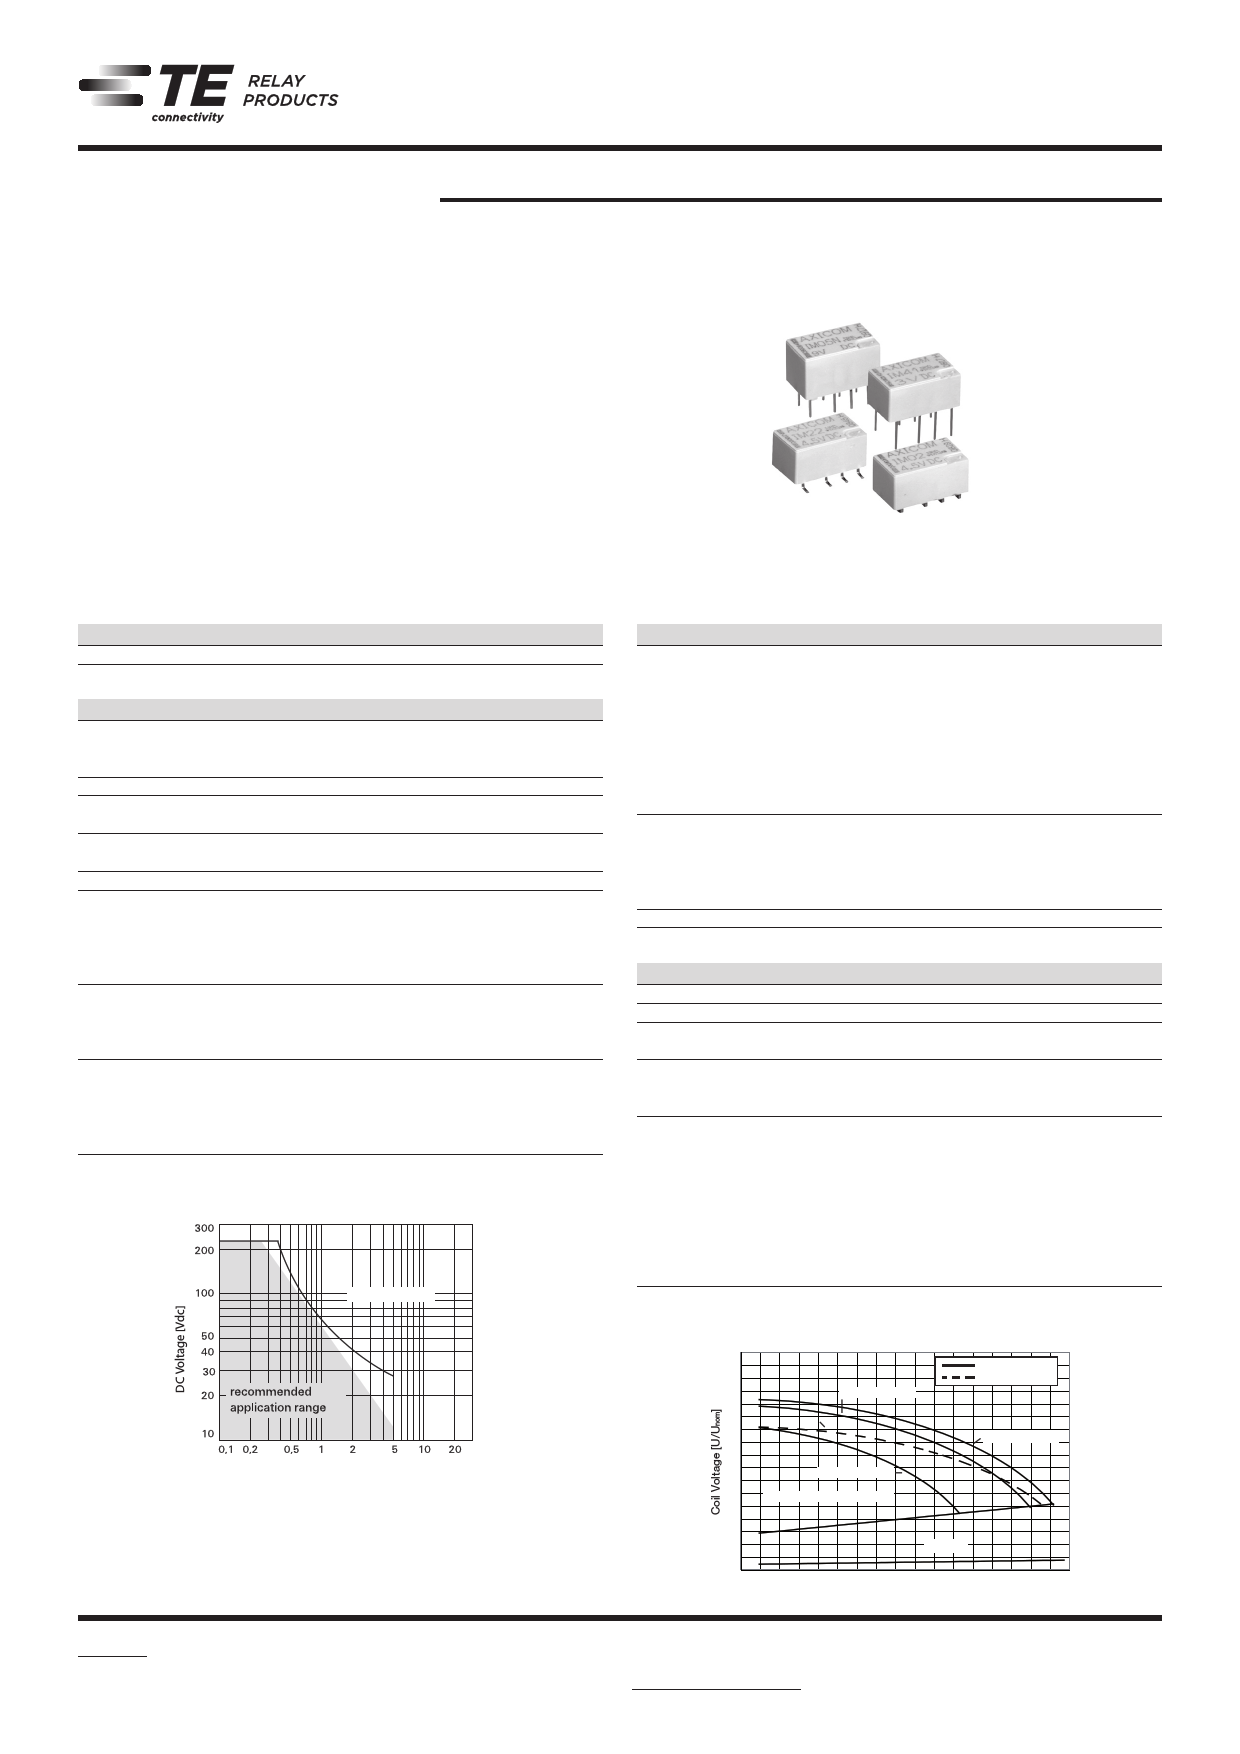 1-1462038-9 Даташит, Описание, Даташиты